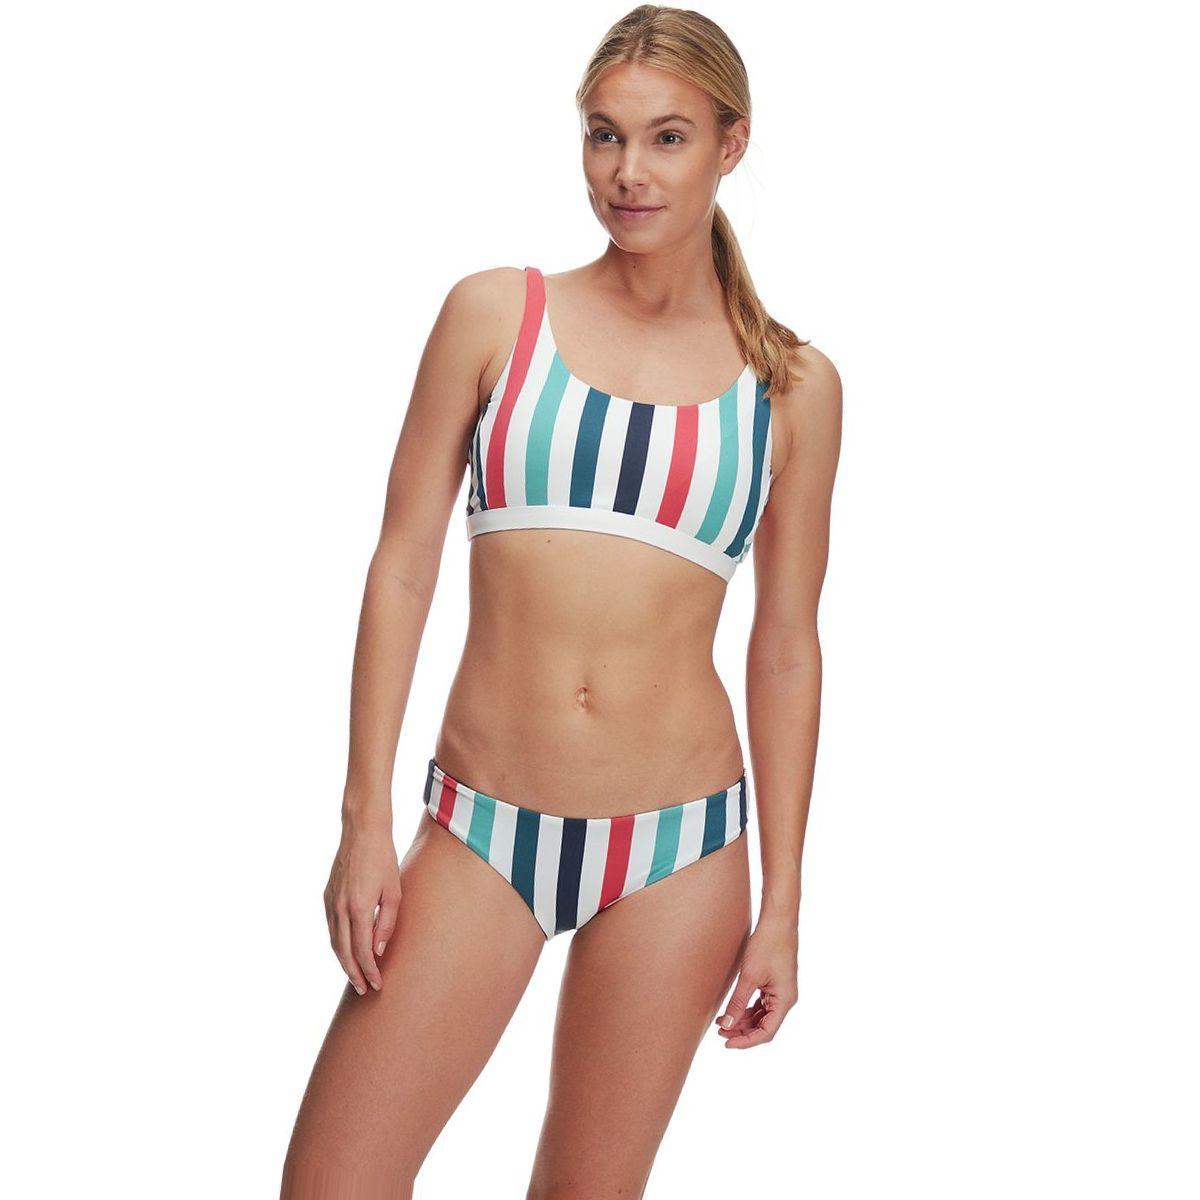 Carve Designs La Jolla Reversible Bikini Bottom - Women's